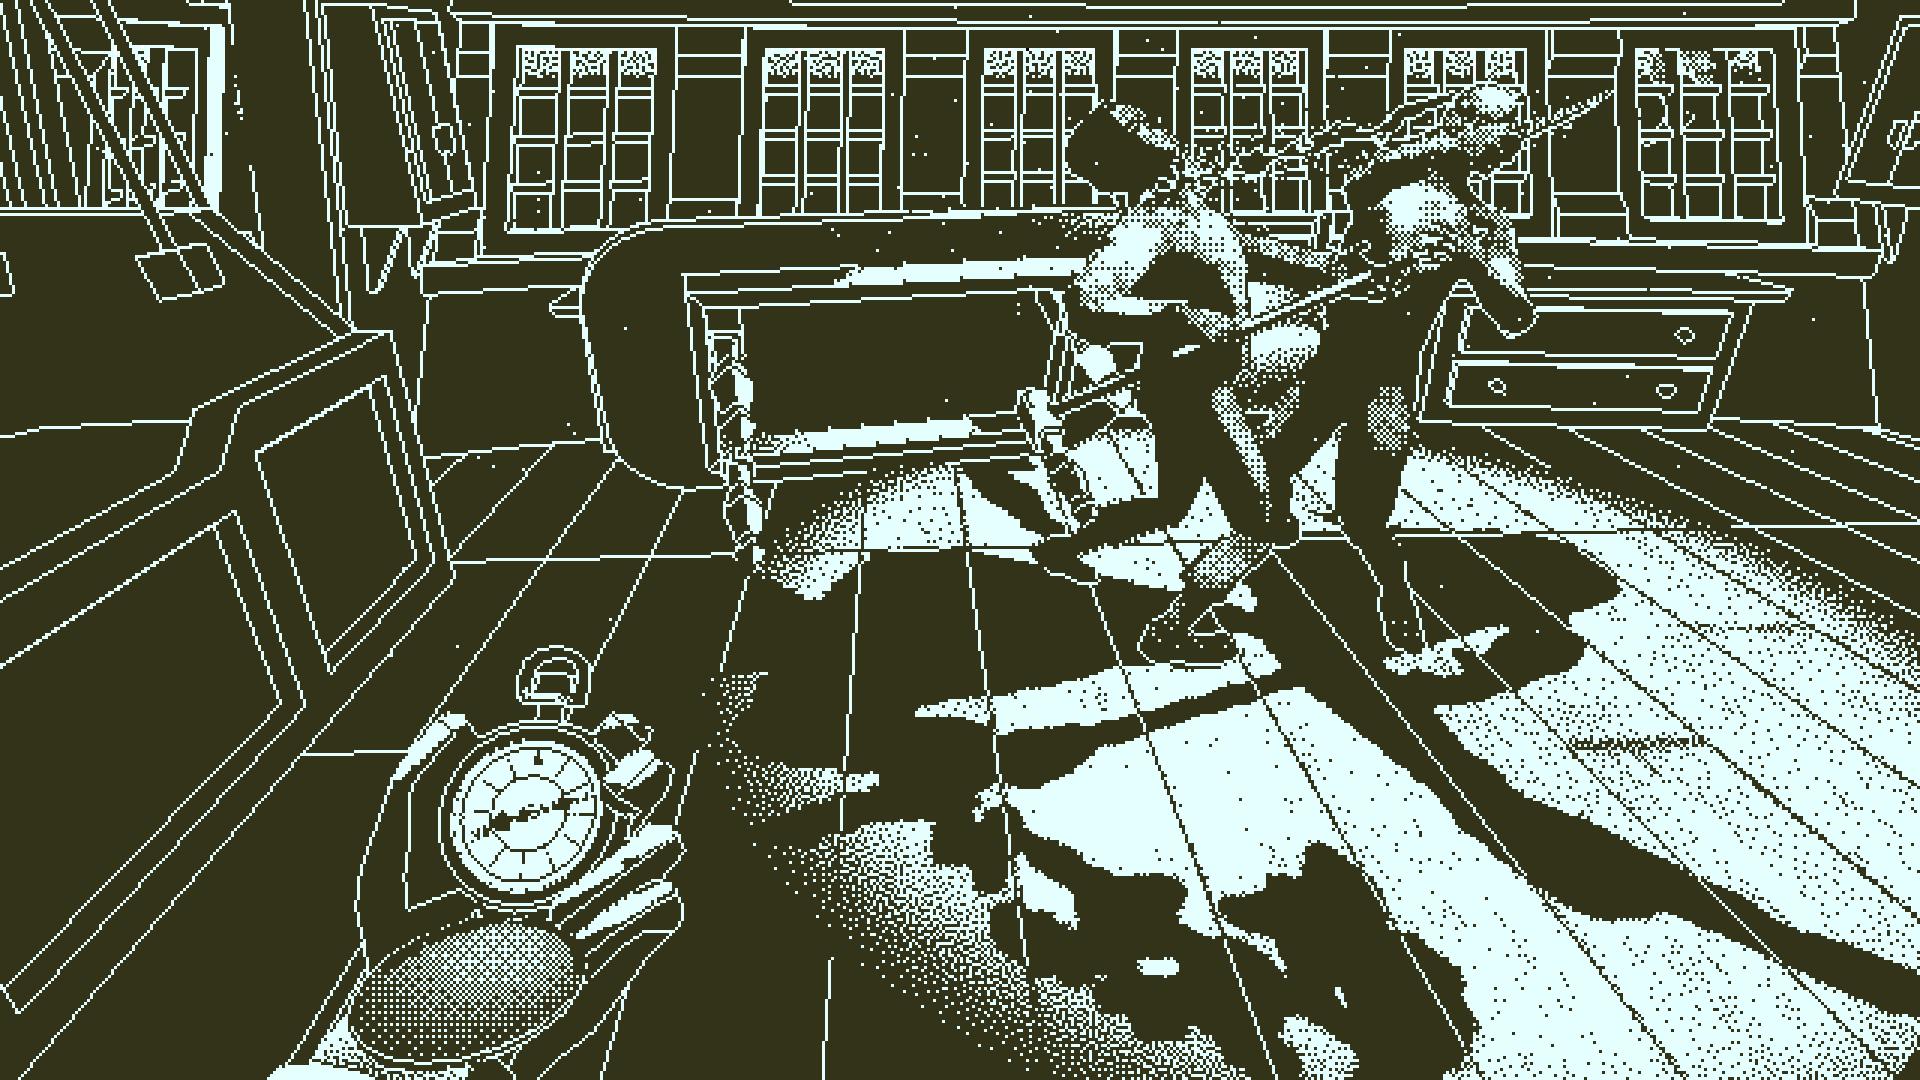 Game image Return of the Obra Dinn